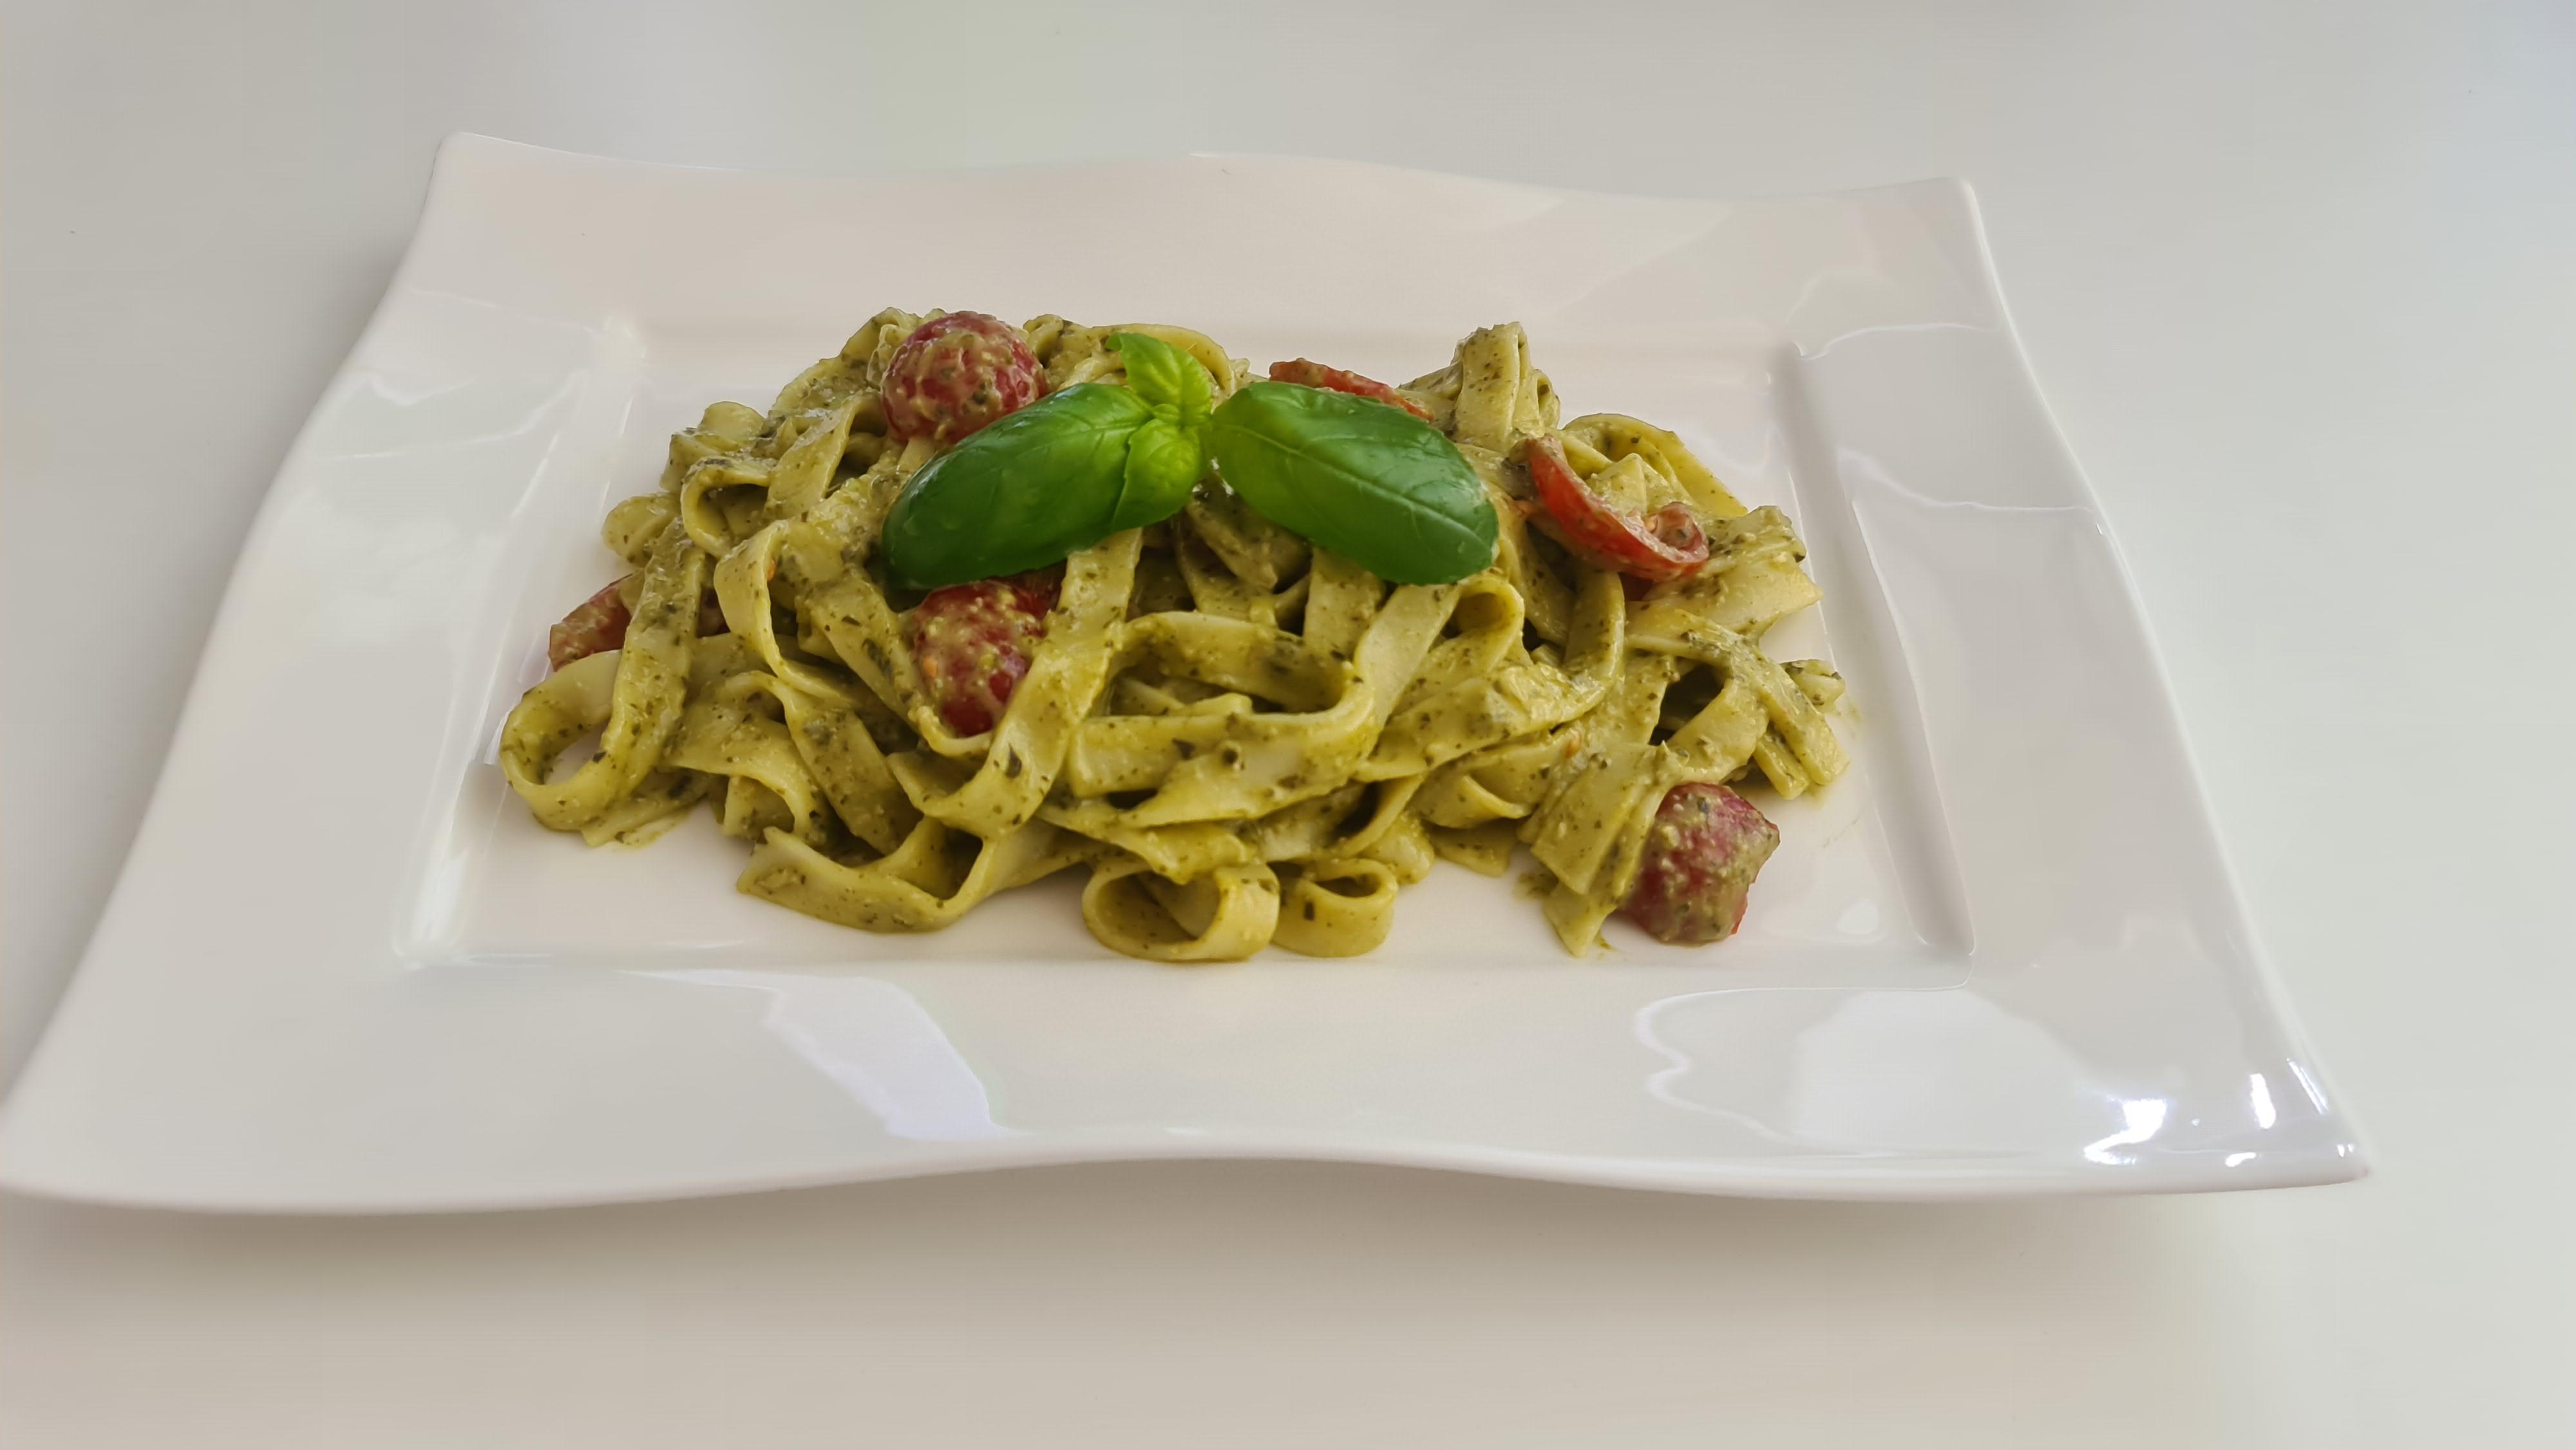 https://foodloader.net/Holz_2020-05-04_Tagliatelle_Basilico_e_Pomodori.jpg